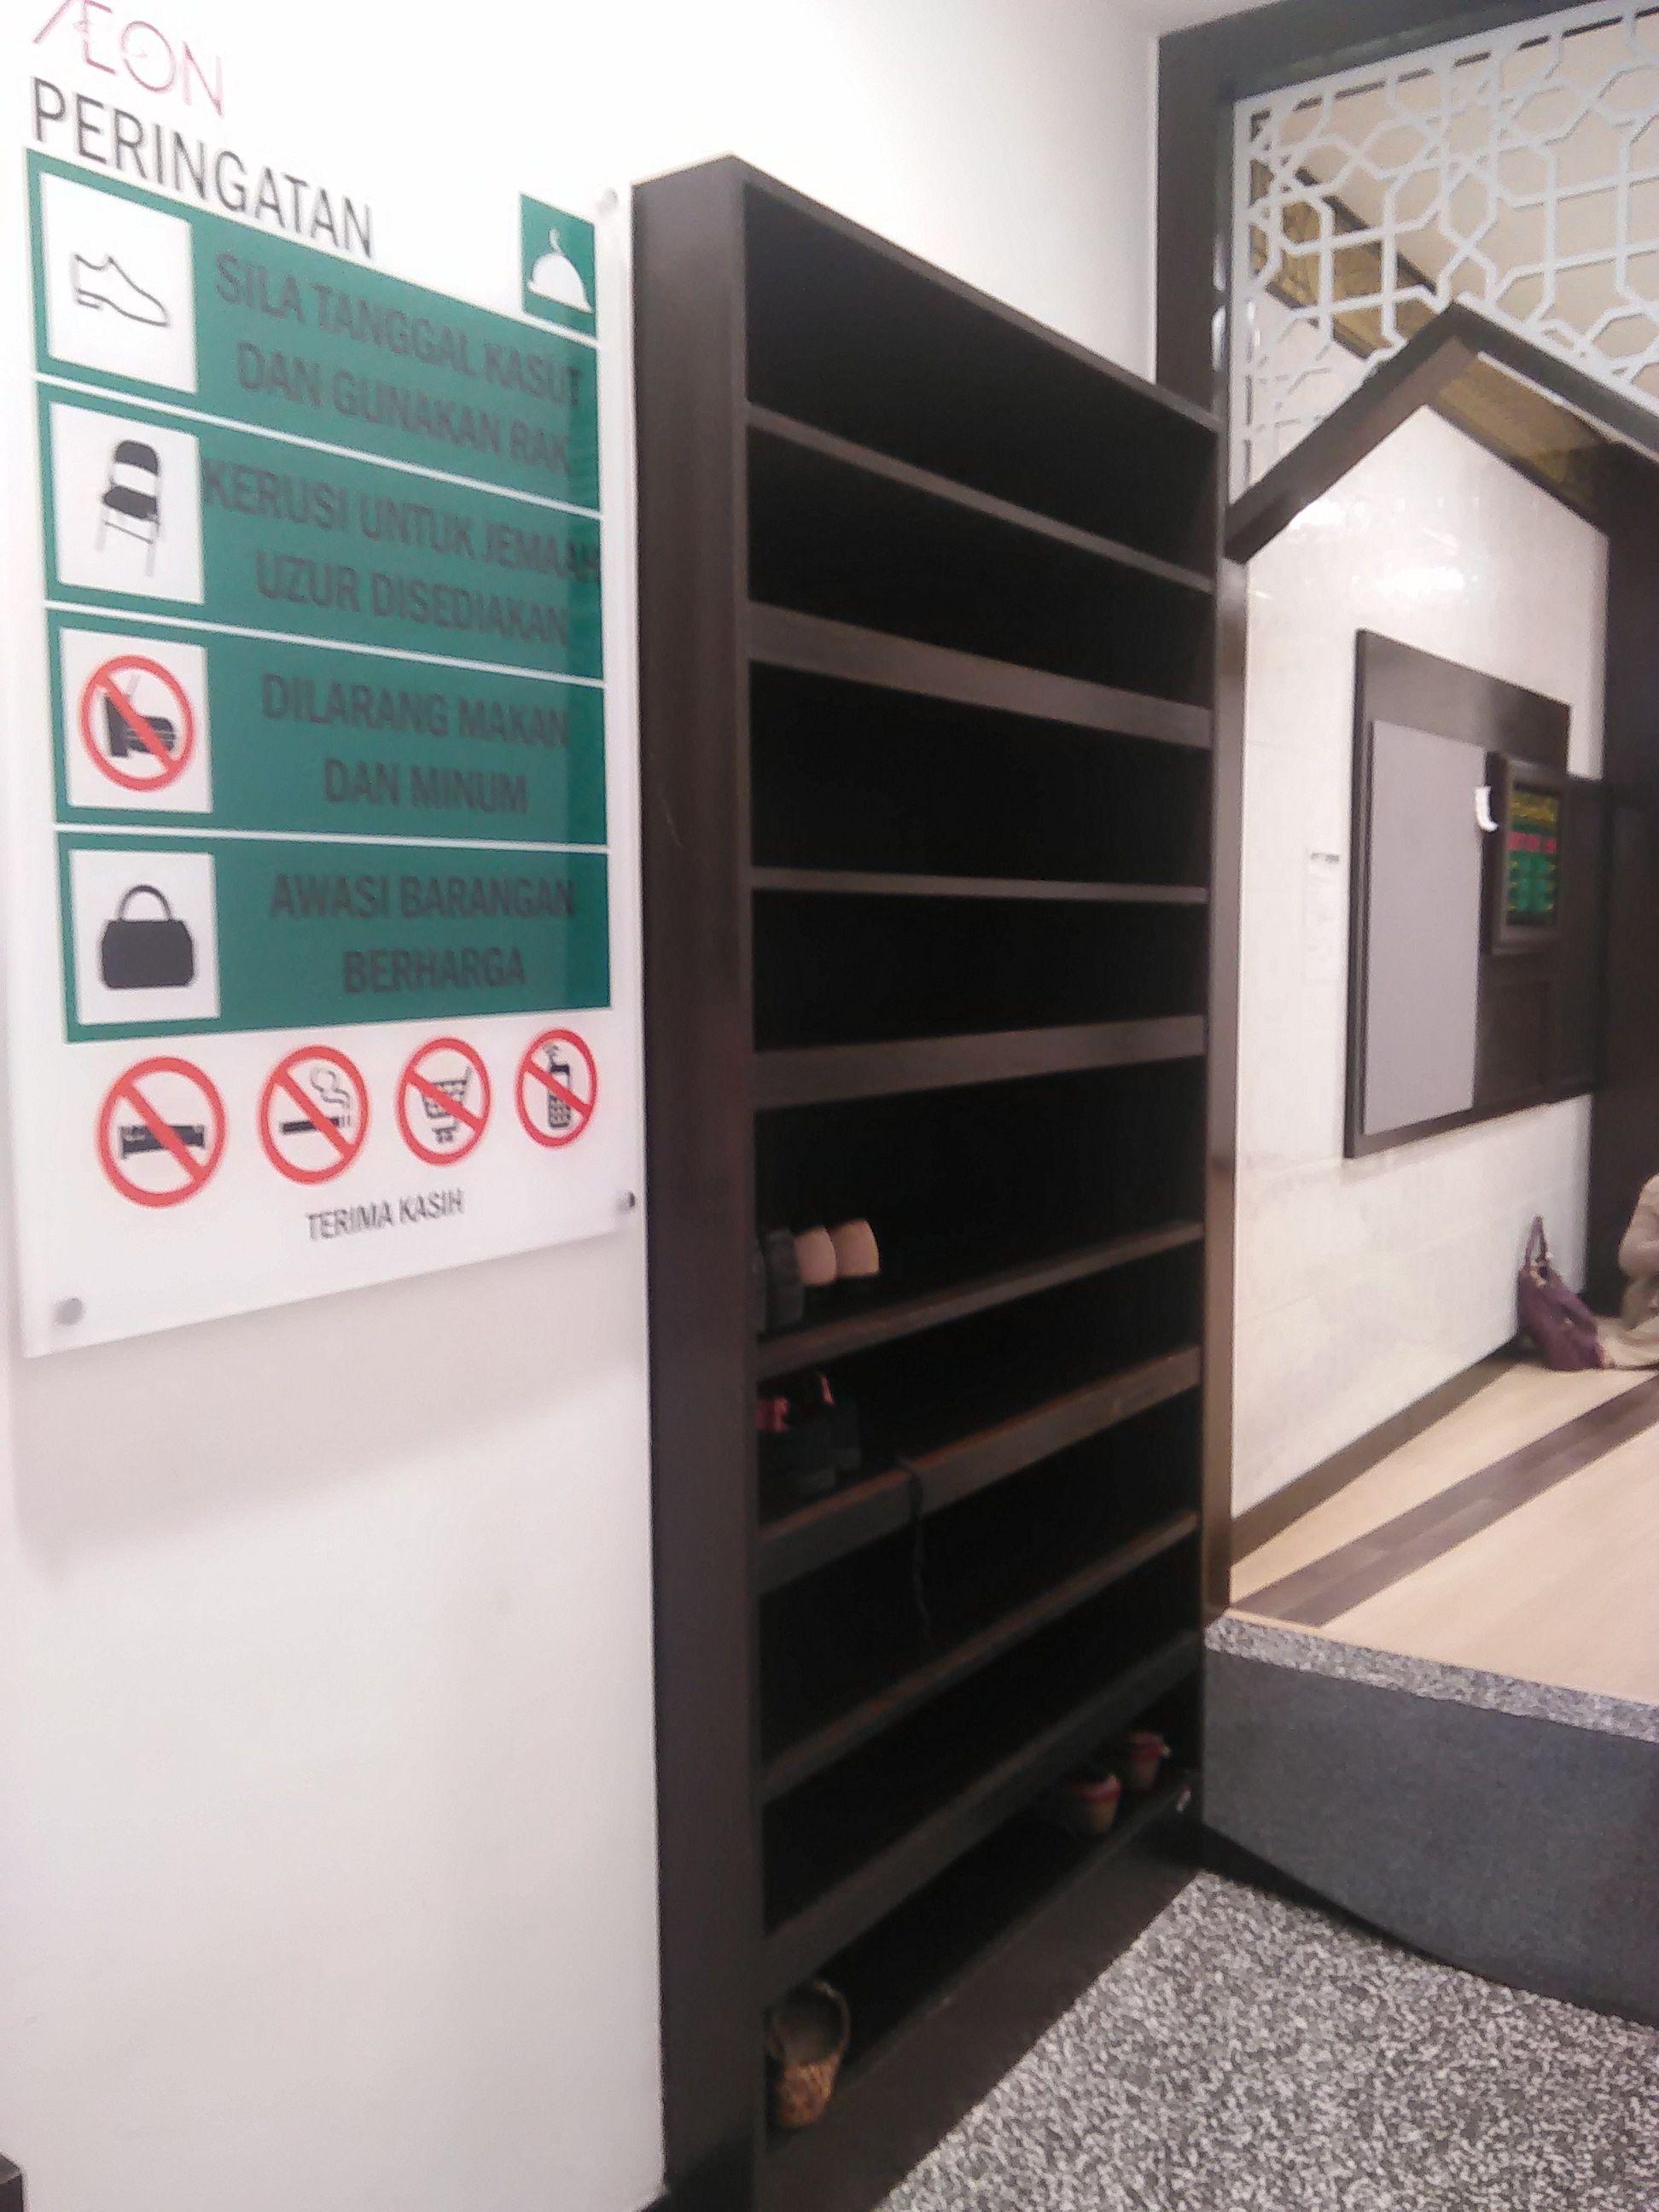 shoe rack & notice board musolla AEON quill city mall